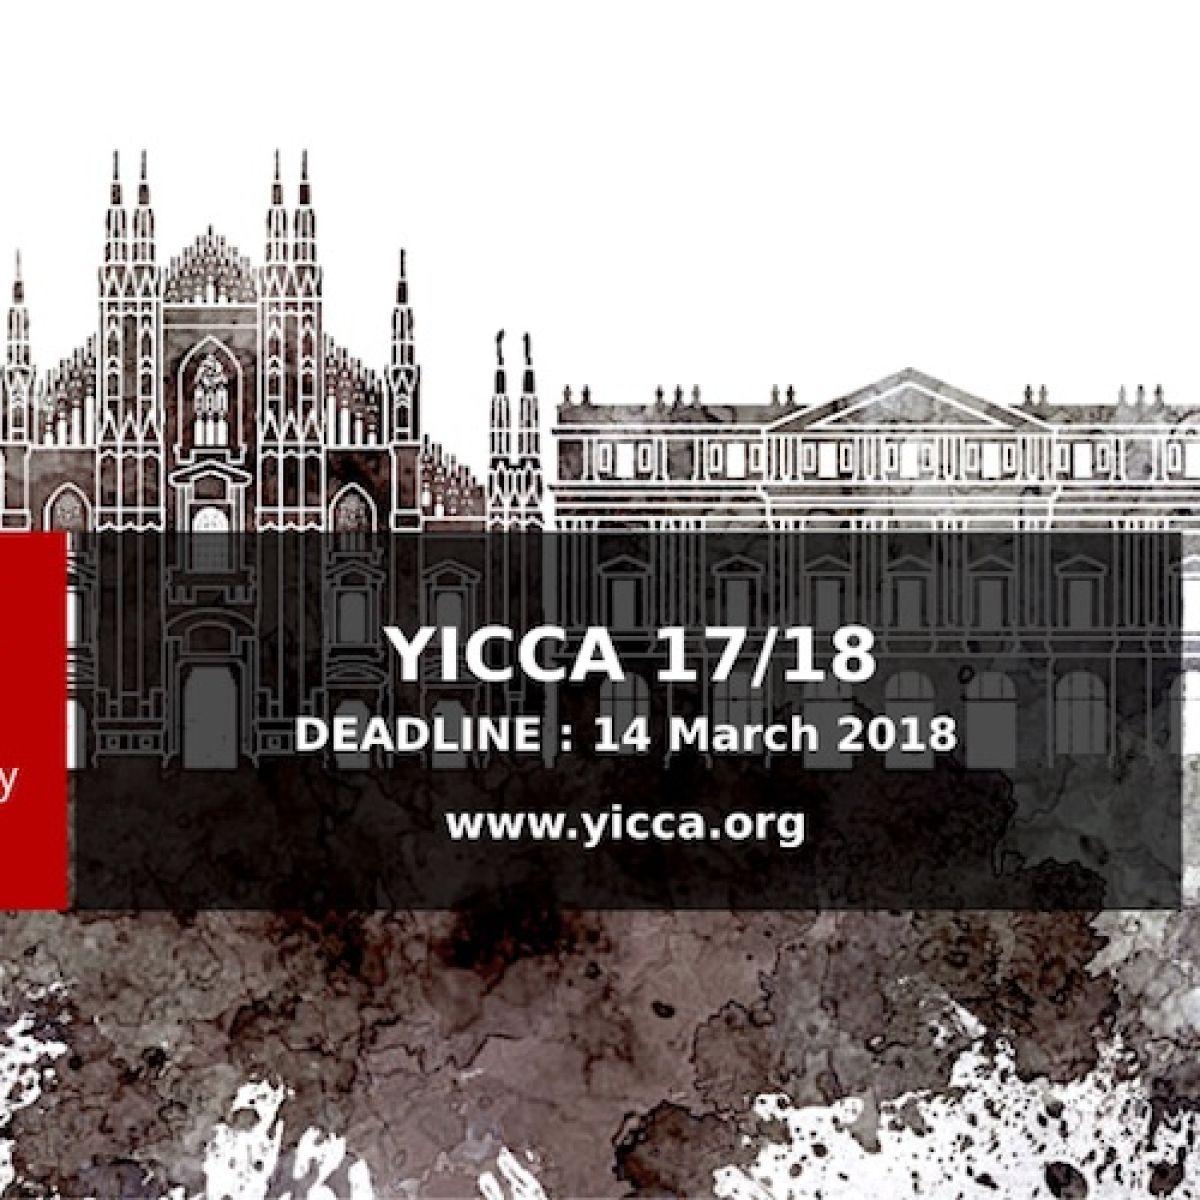 Konkurs YICCA 17/18 - International Contest of Contemporary Art